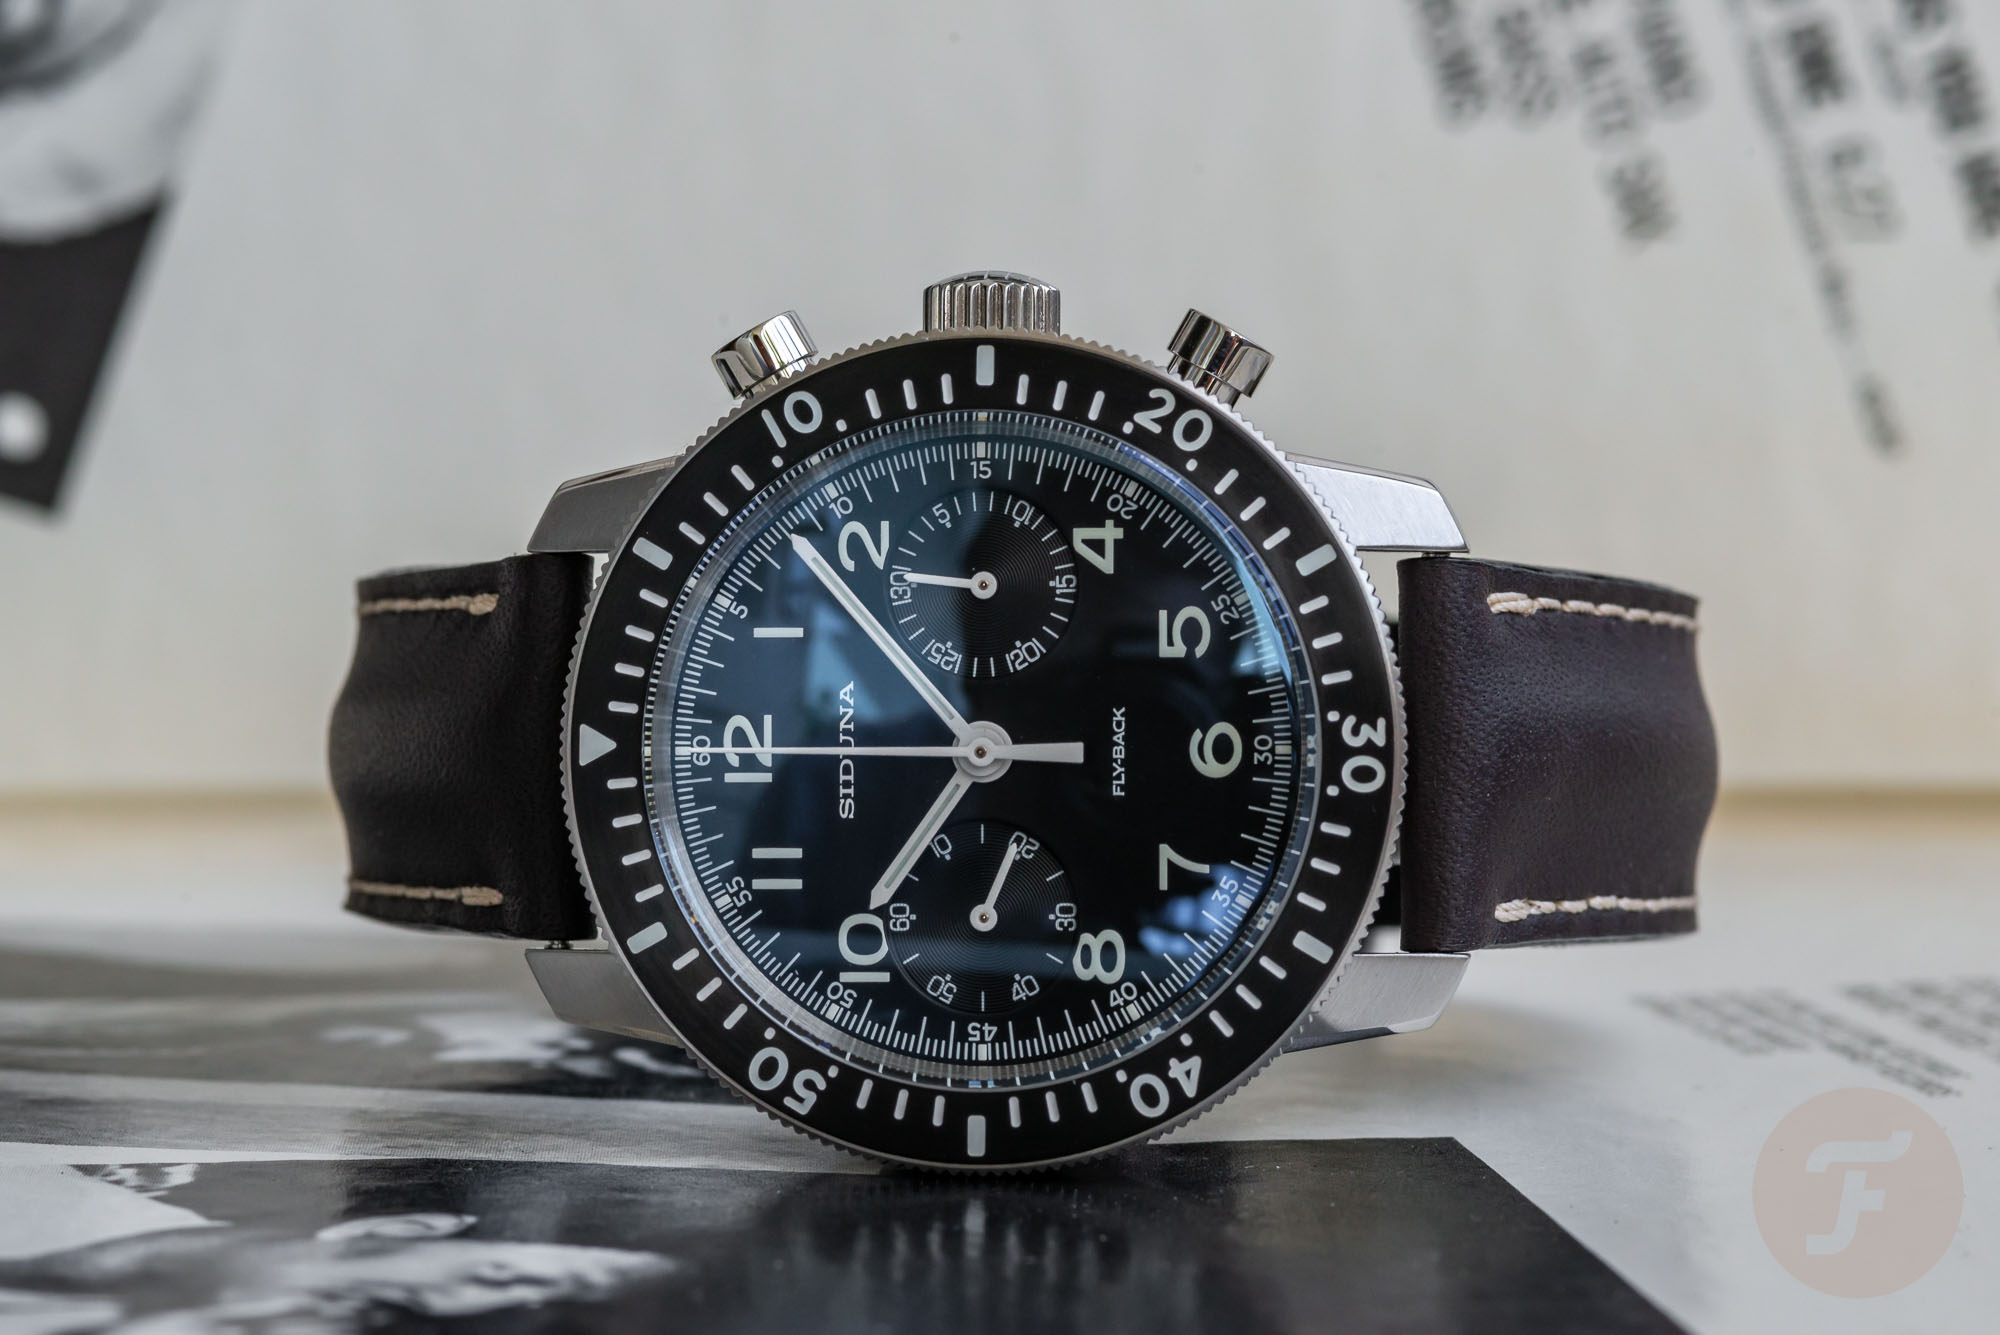 Siduna M3440 Flyback Chronograph